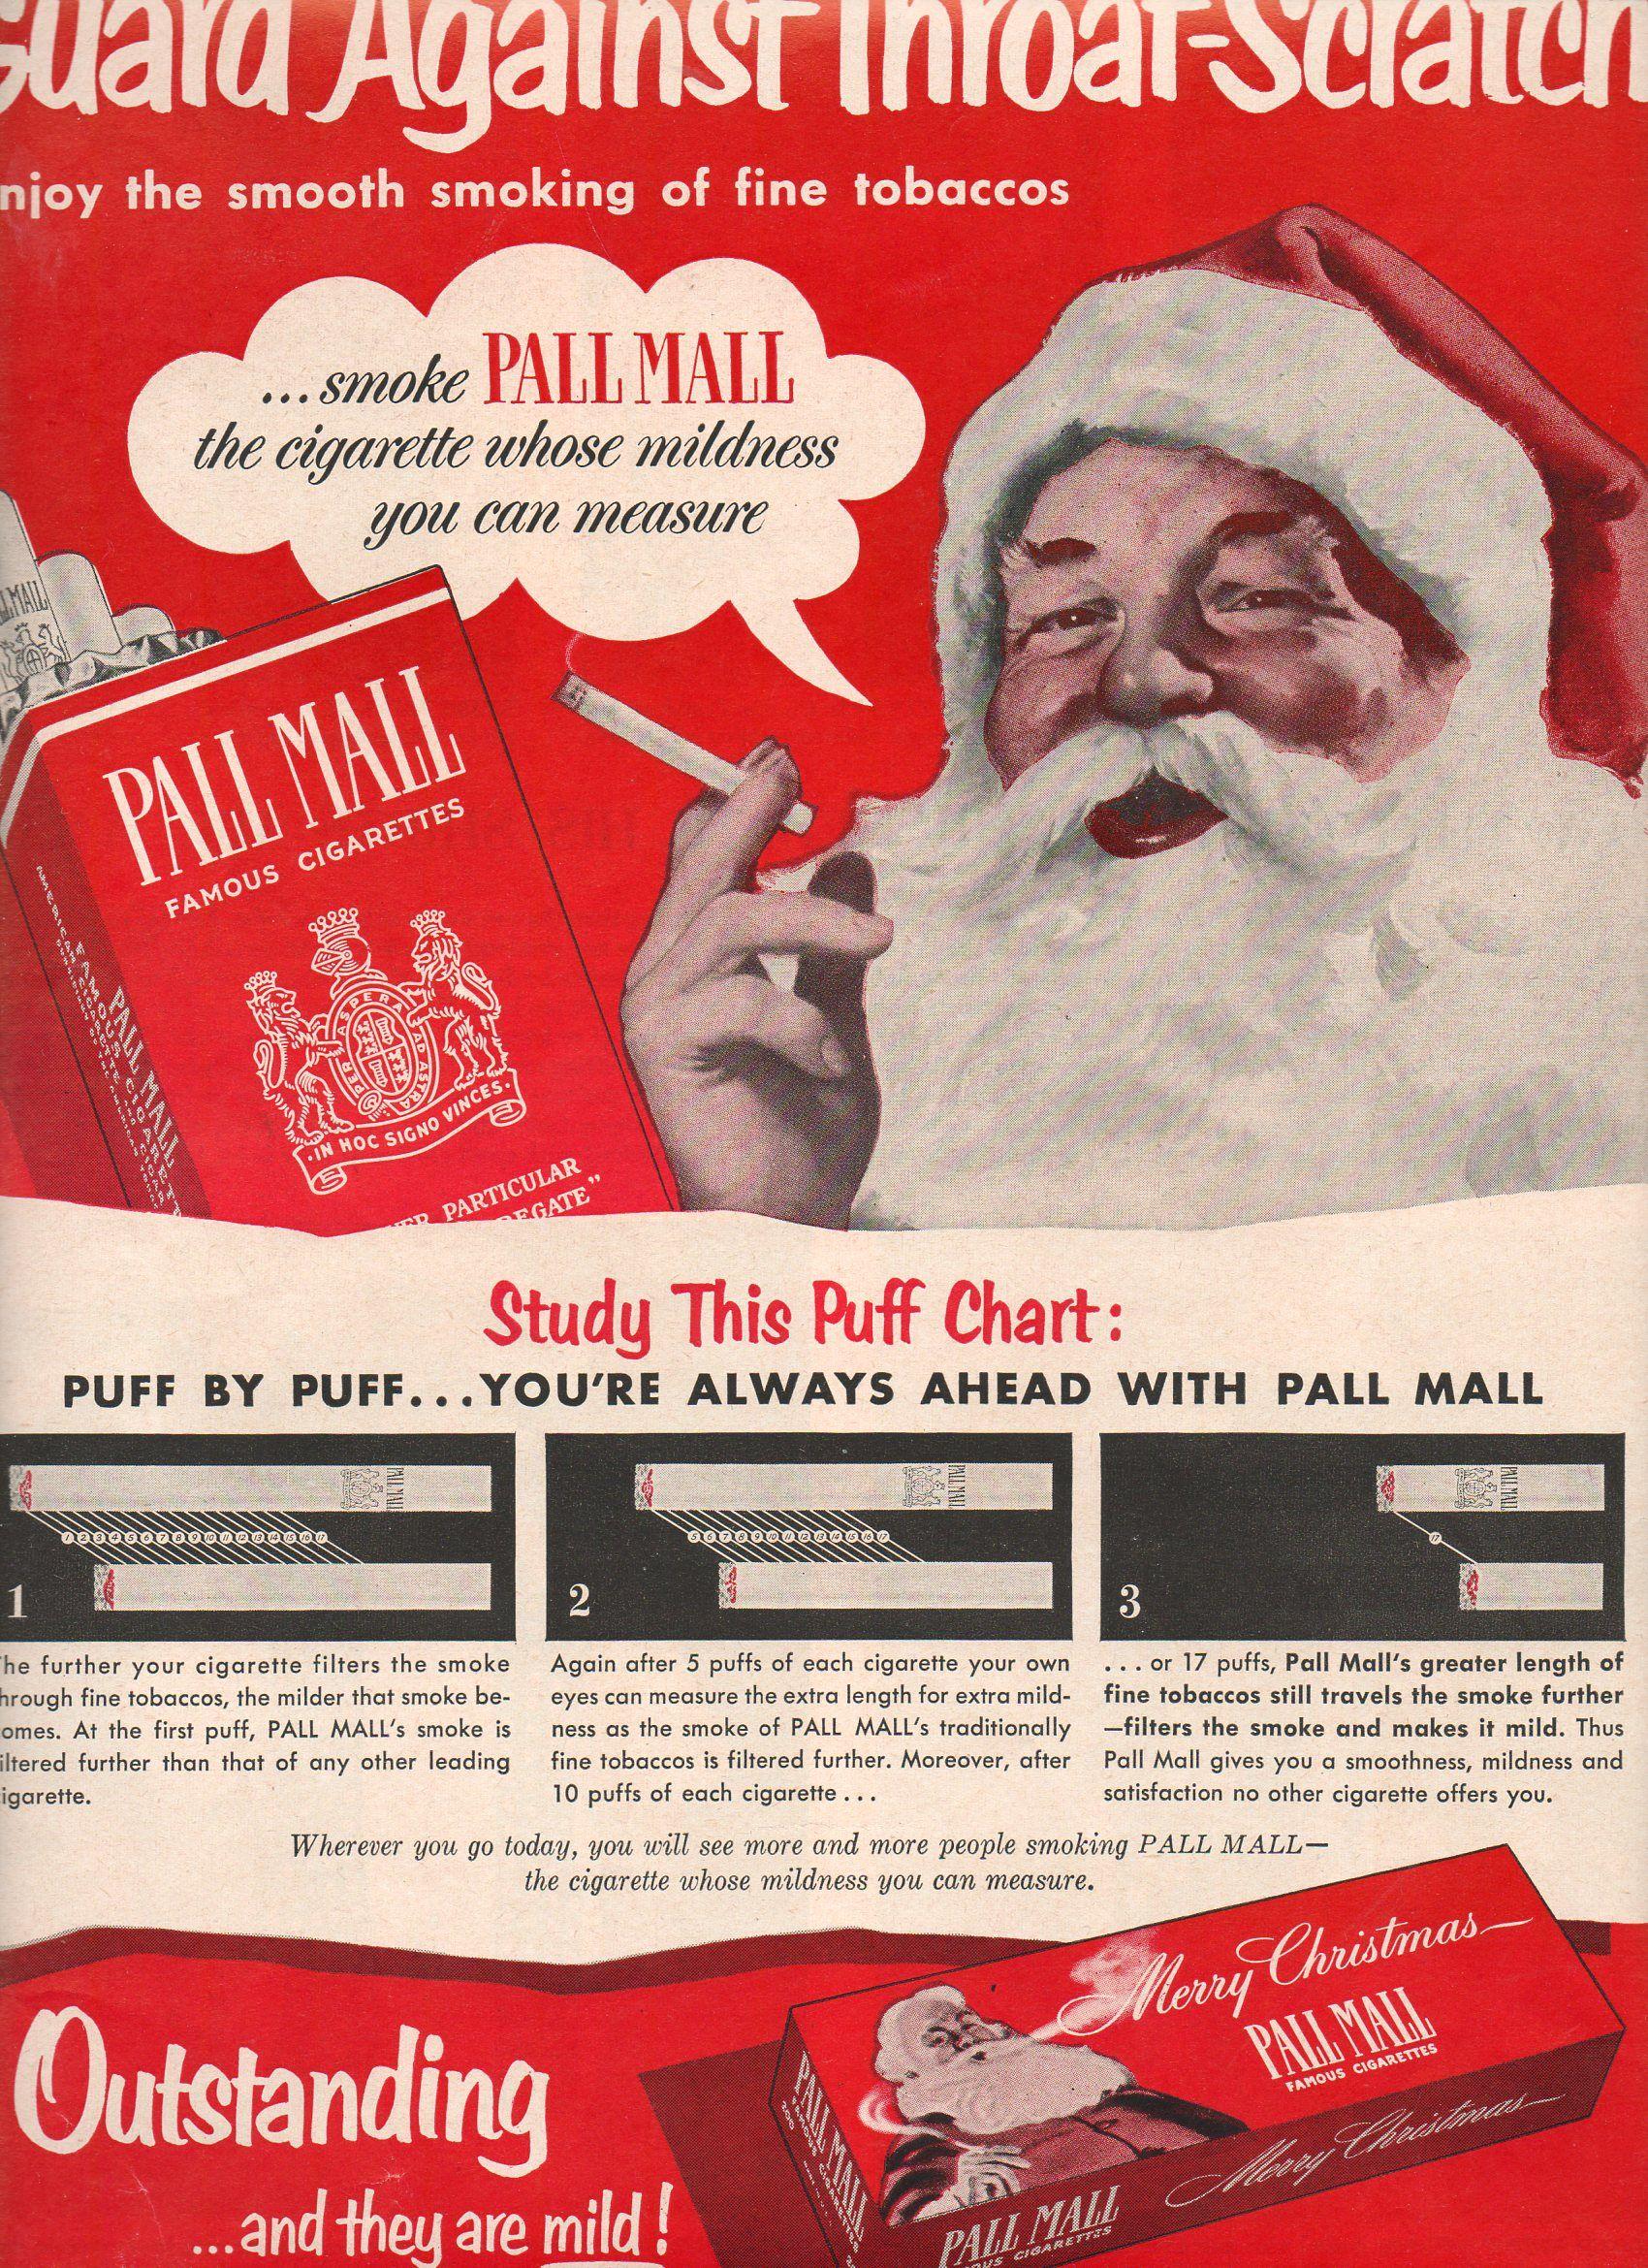 Guard Against Scratchy Throat, Santa! Bring Us Pall Malls!